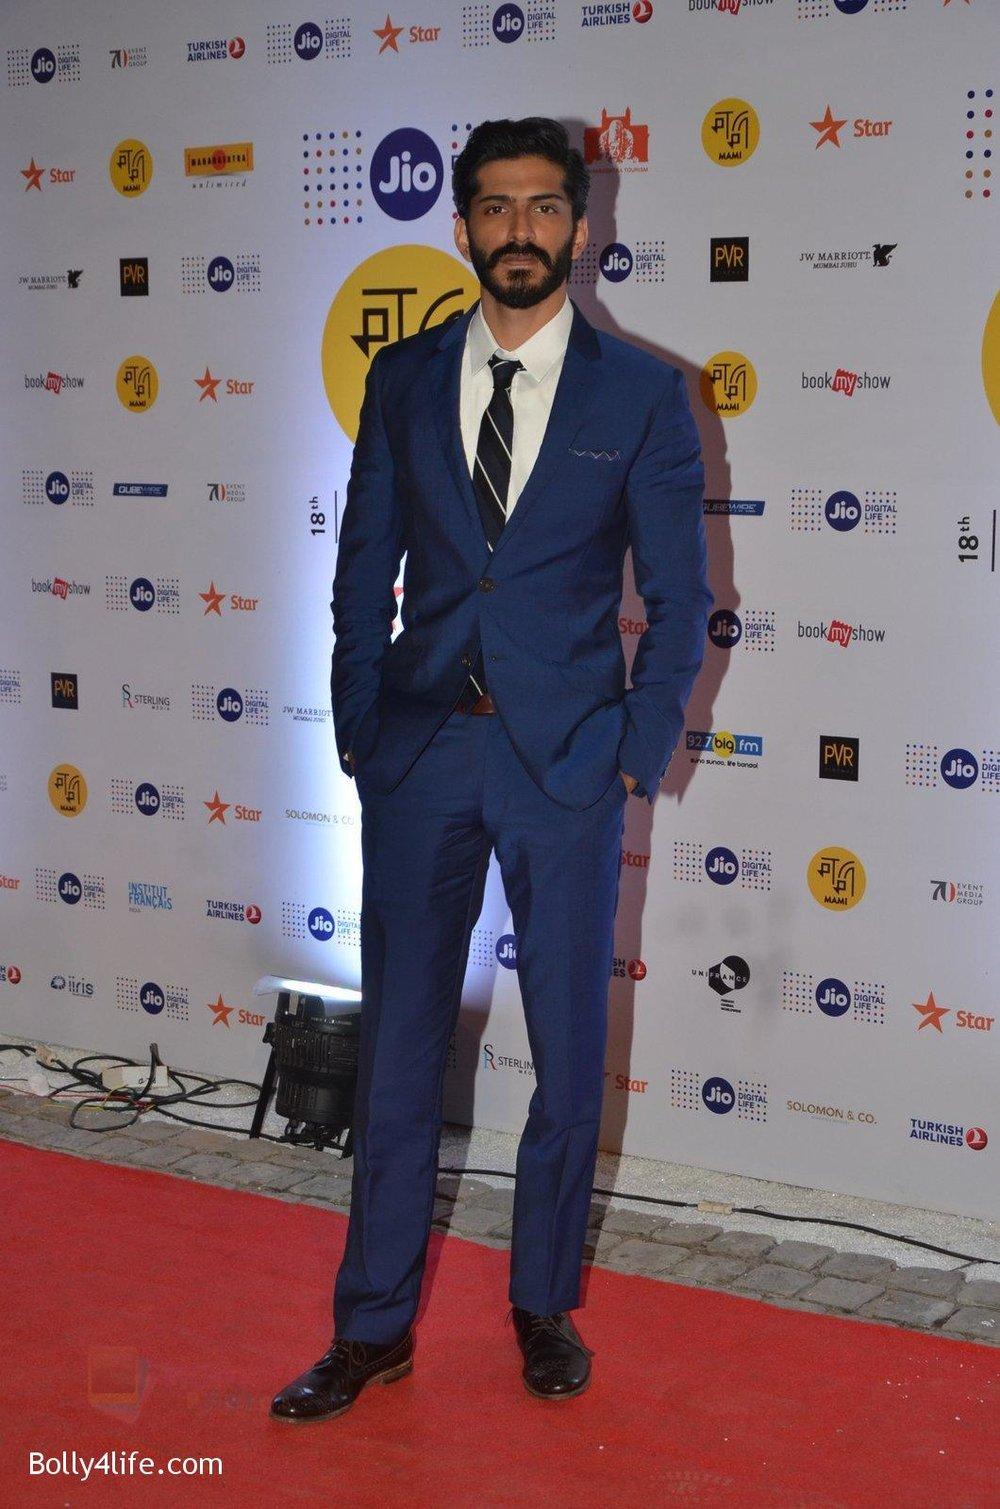 Harshvardhan-Kapoor-at-MAMI-Film-Festival-2016-on-20th-Oct-2016-310.jpg